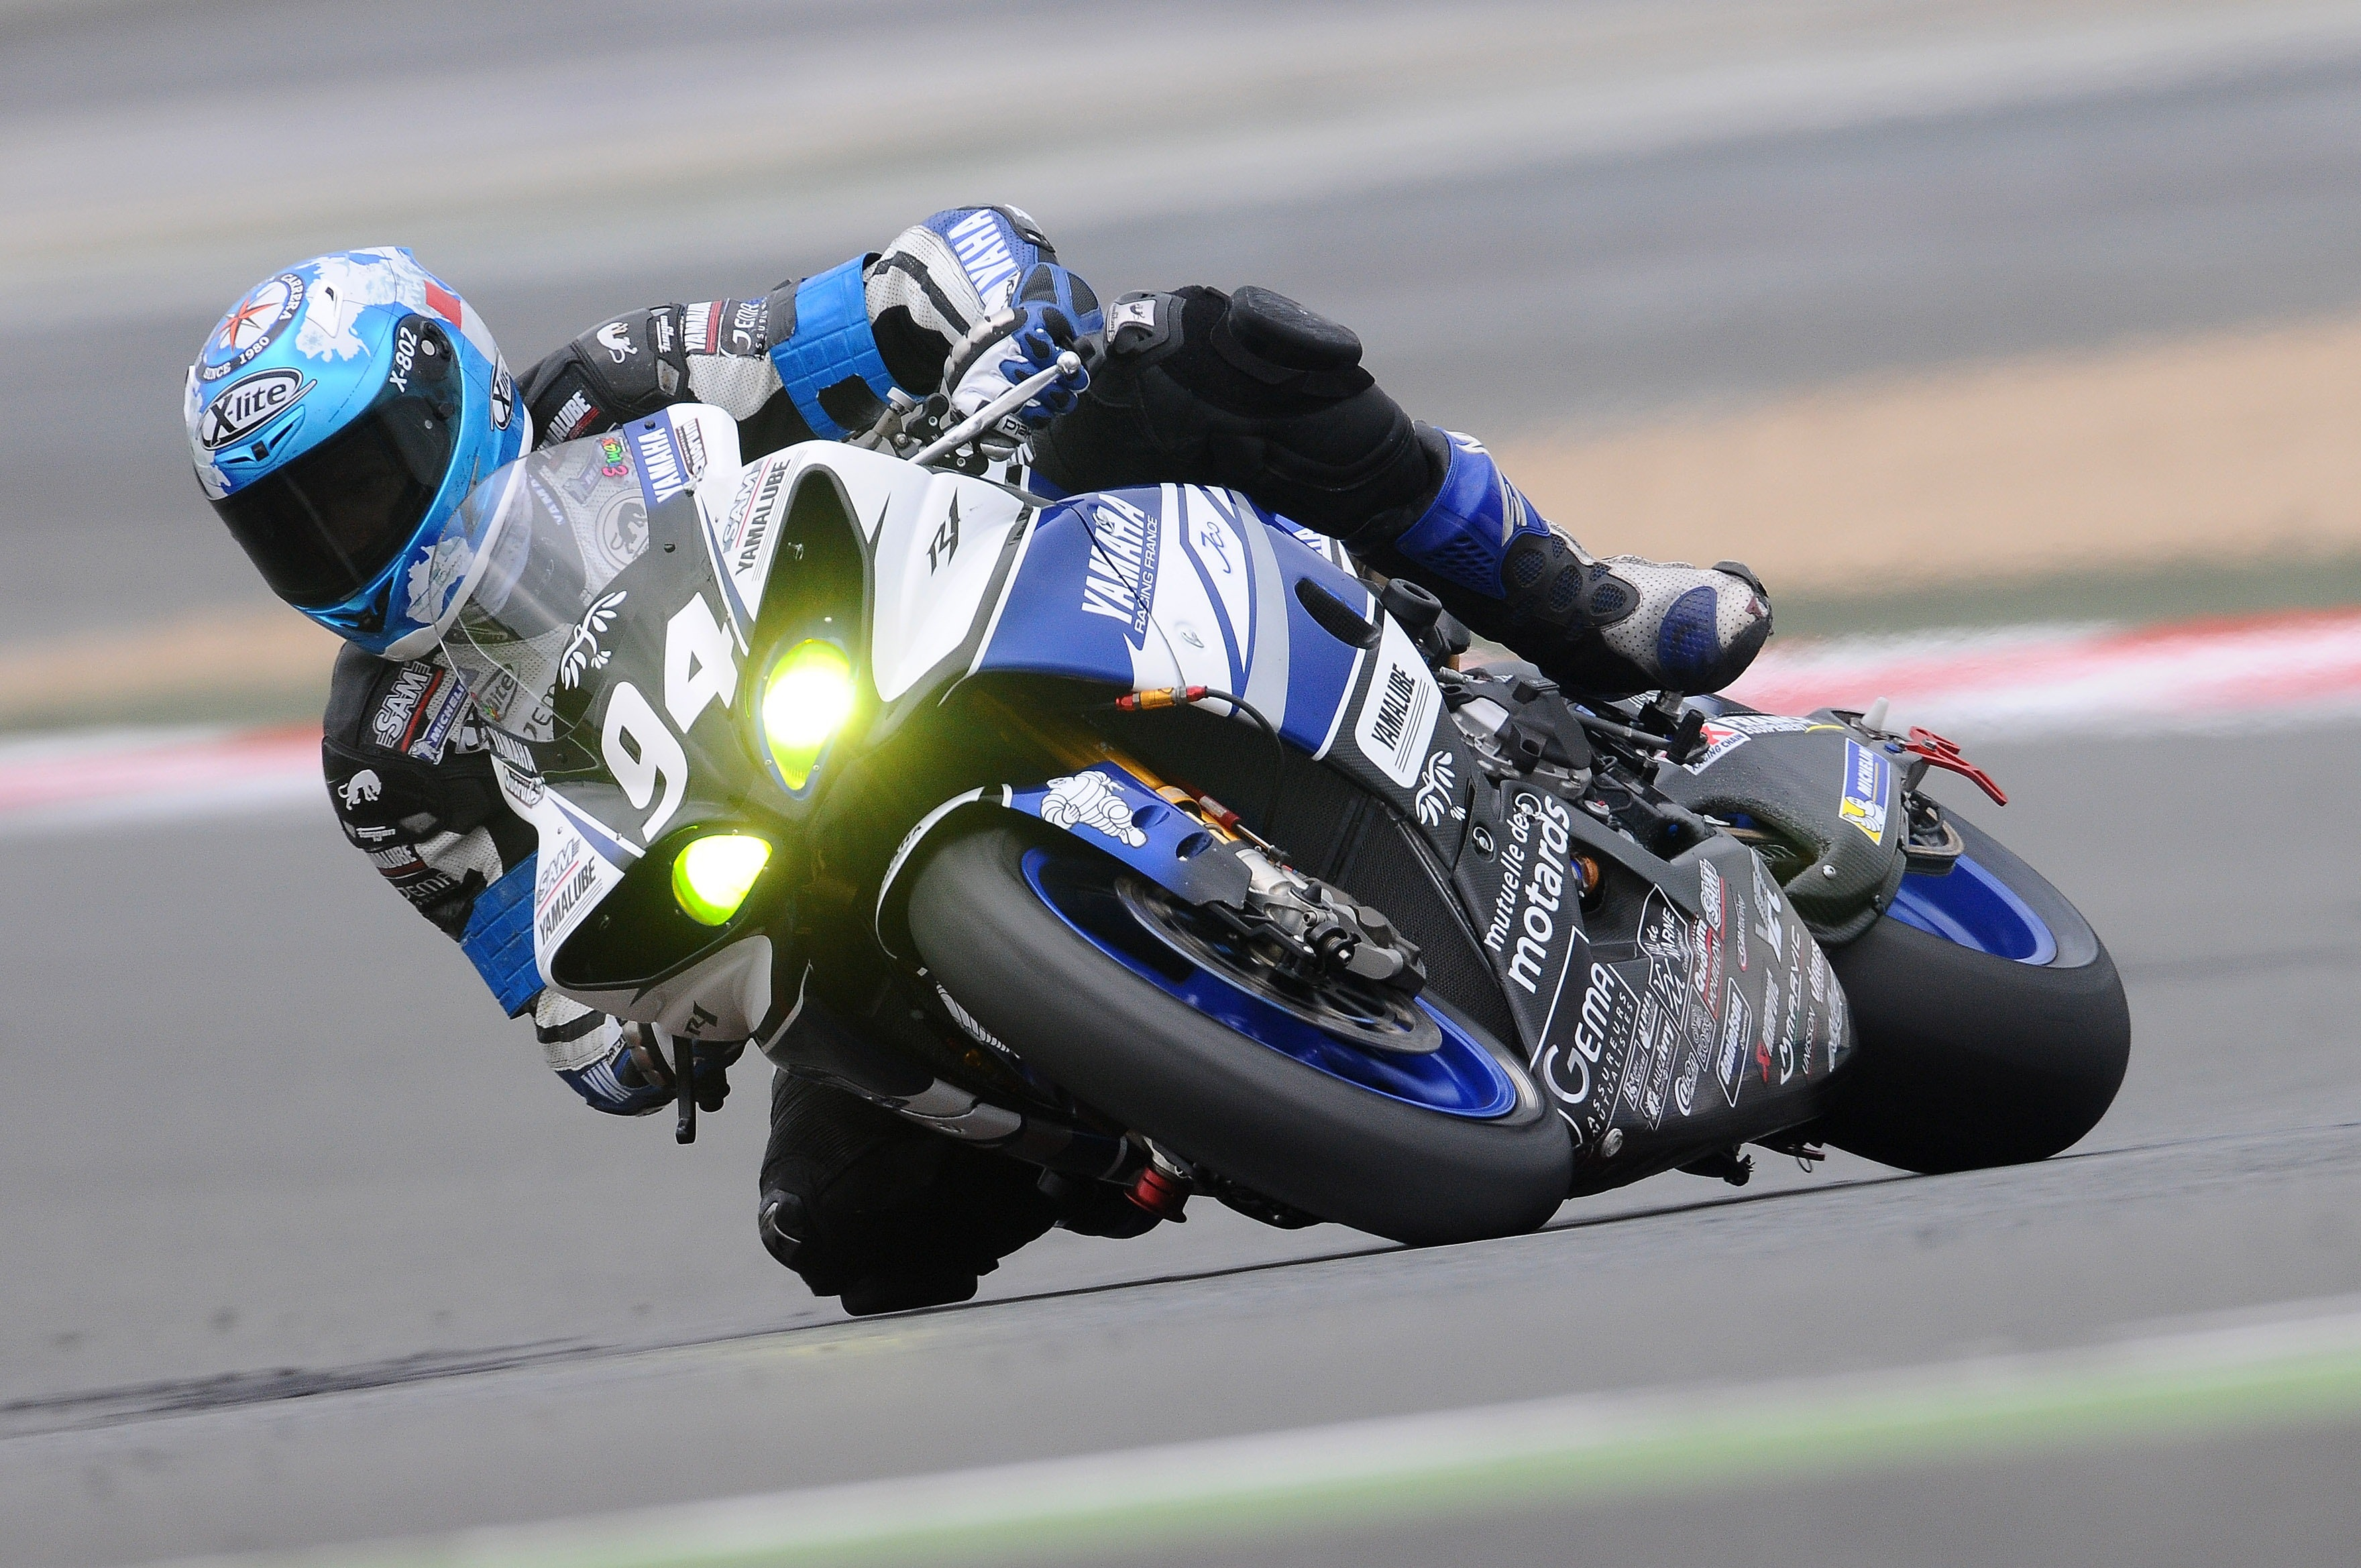 Blue Yamaha R1, Bike, Biker, Motorbike, Race, HQ Photo